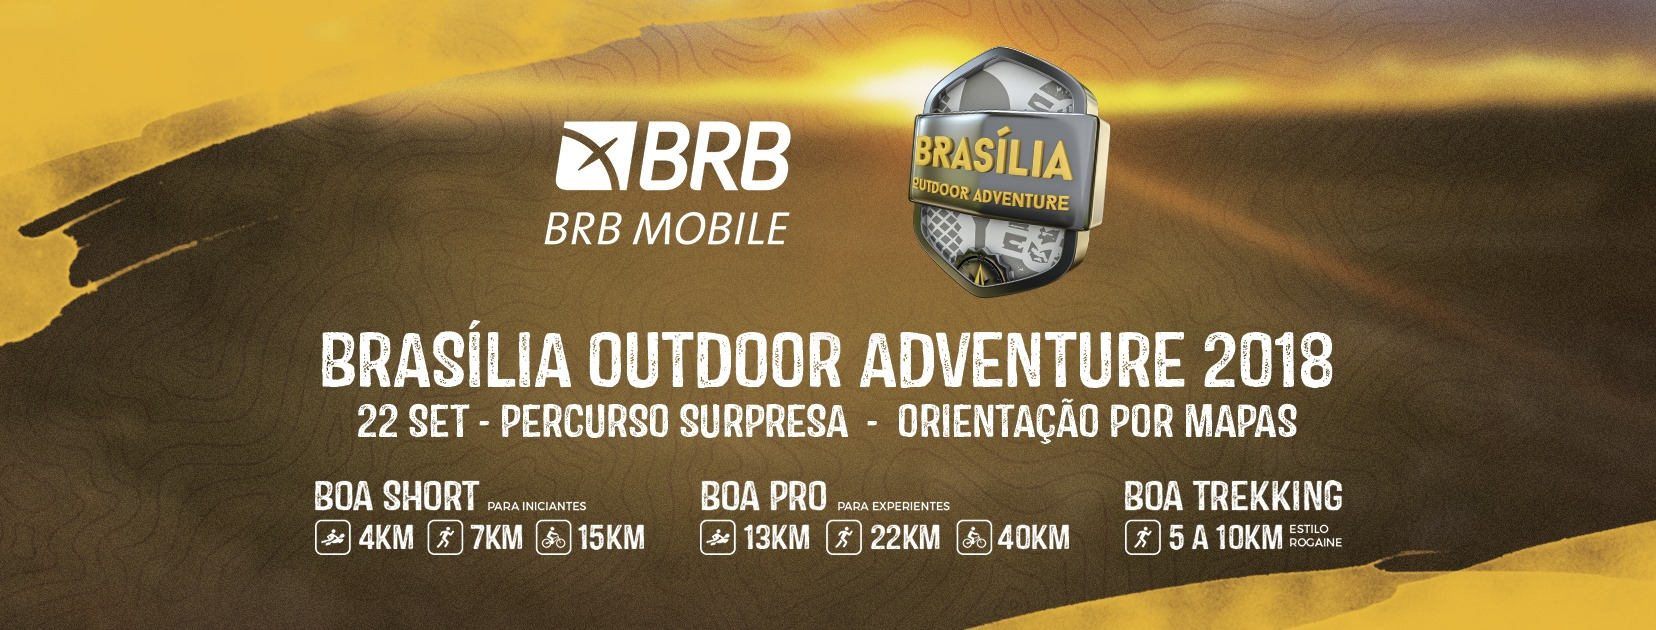 BRB BRASÍLIA OUTDOOR ADVENTURE 2018